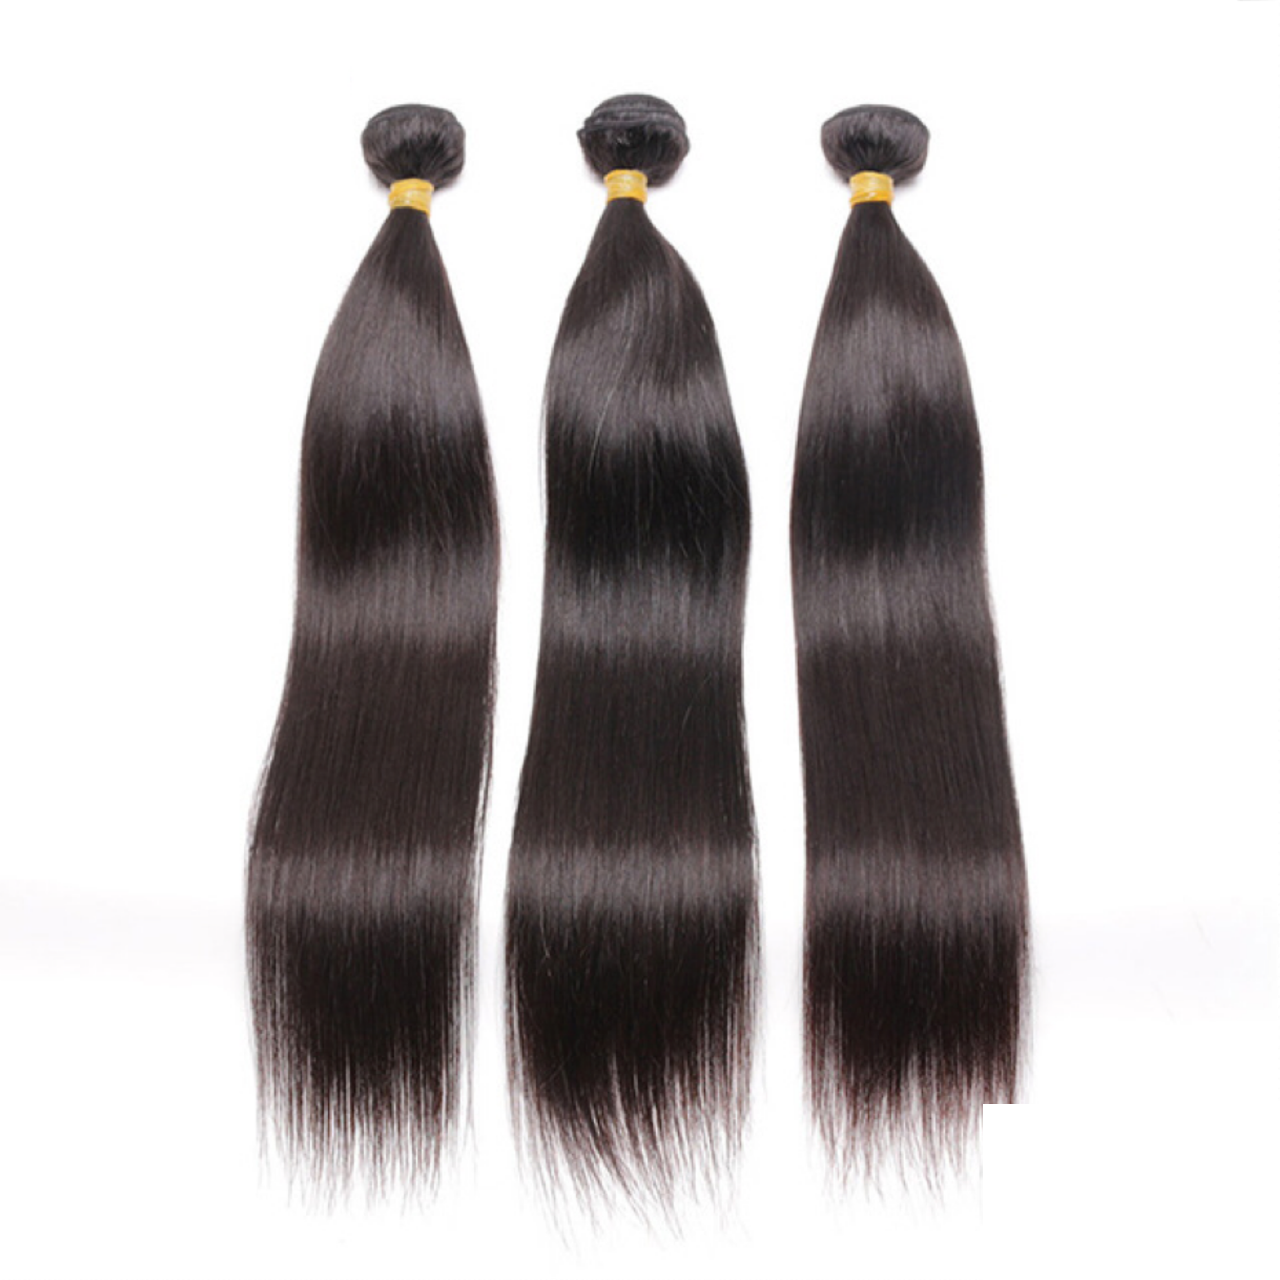 Image of Peruvian Silky Straight